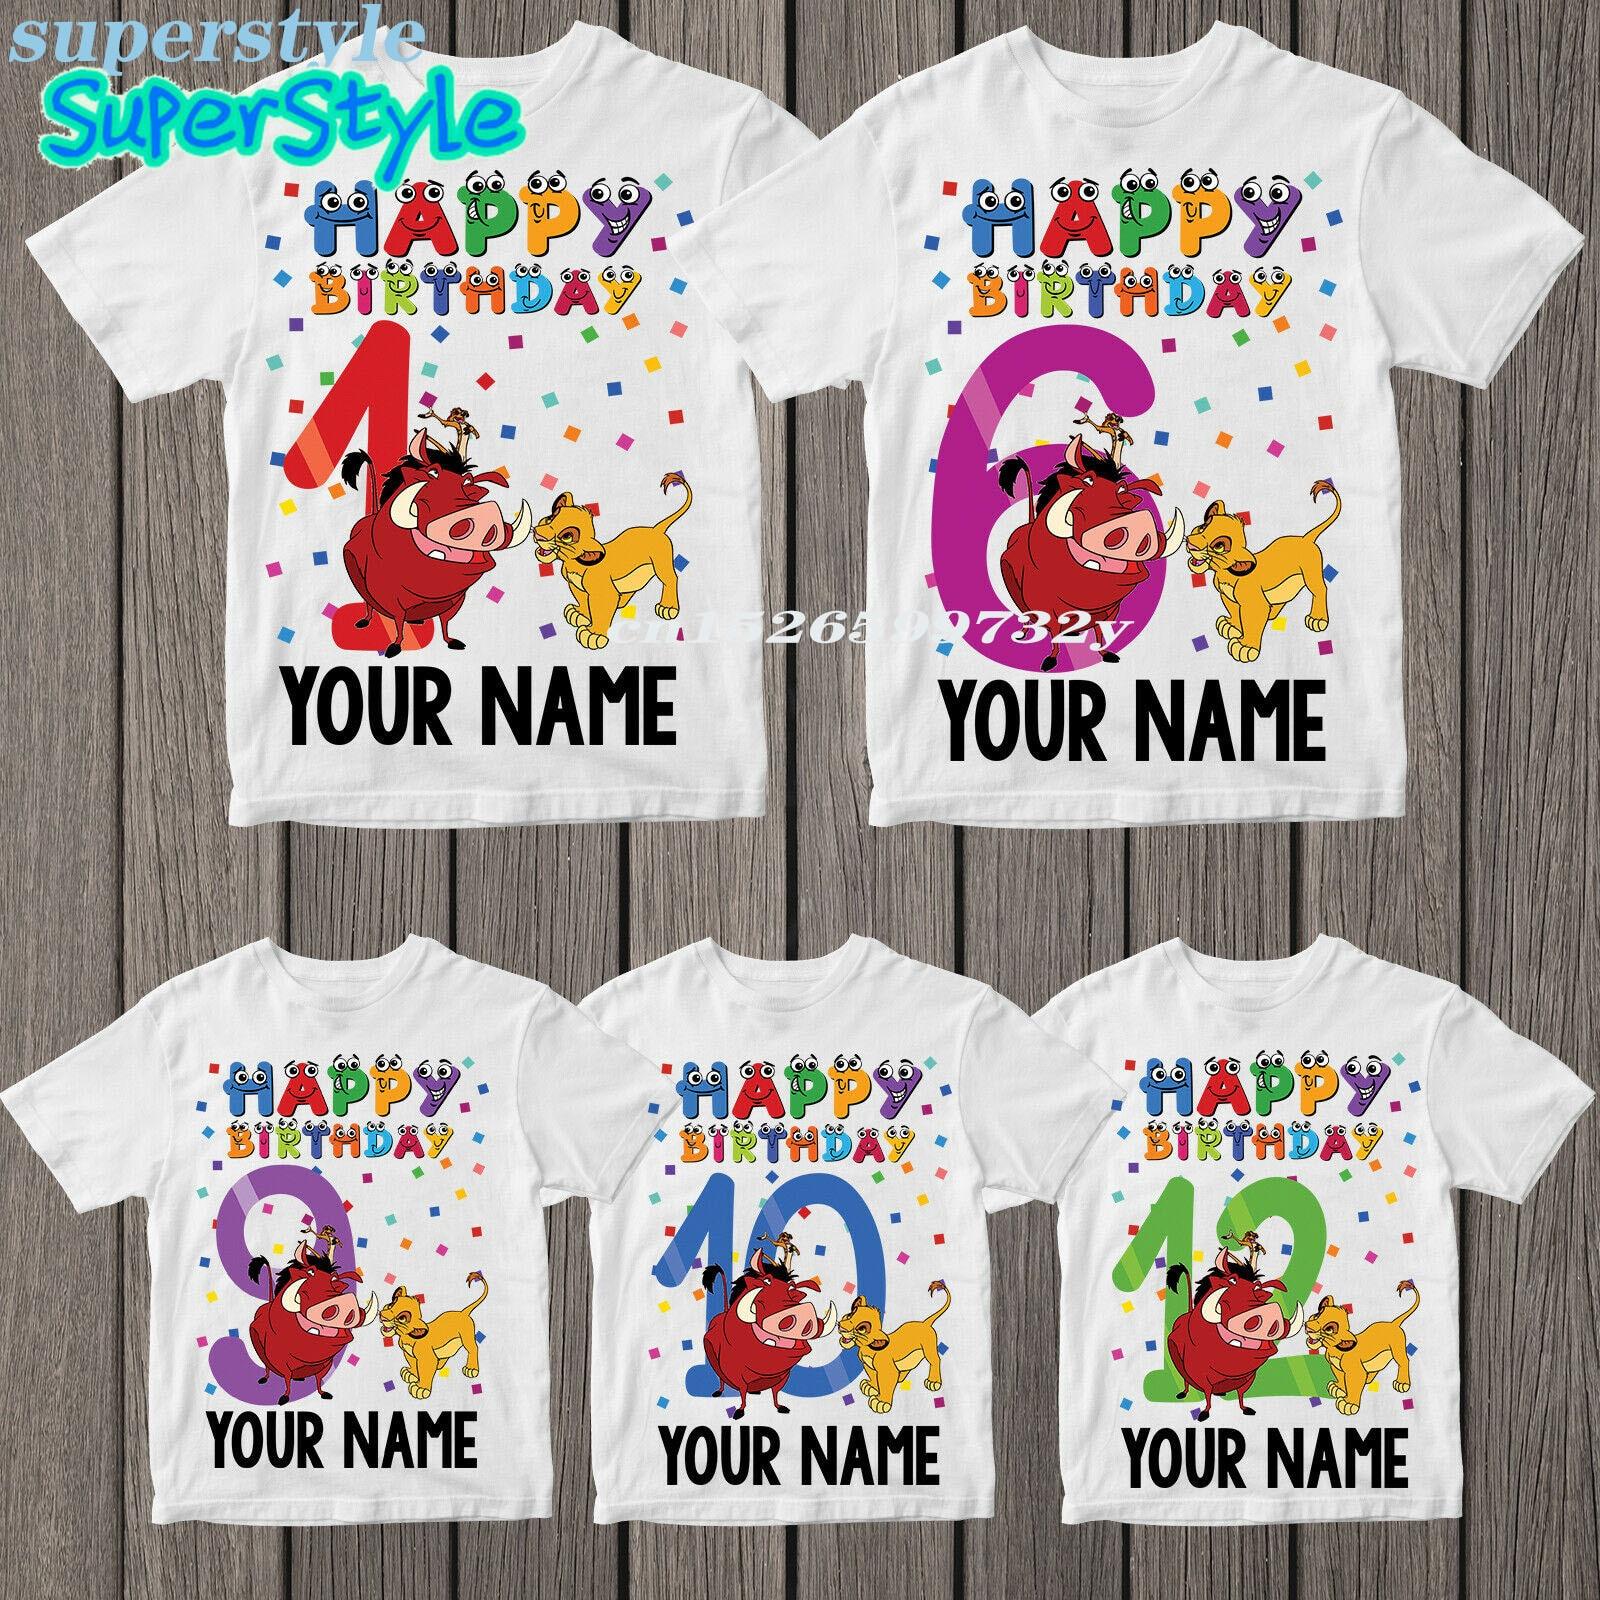 2021 Number 1-12 Cartoon Lion King Shirts Kid Happy Birthday Boys Simba Funny Girls t-shirt Harajuku Kids tops Clothes dHKP405